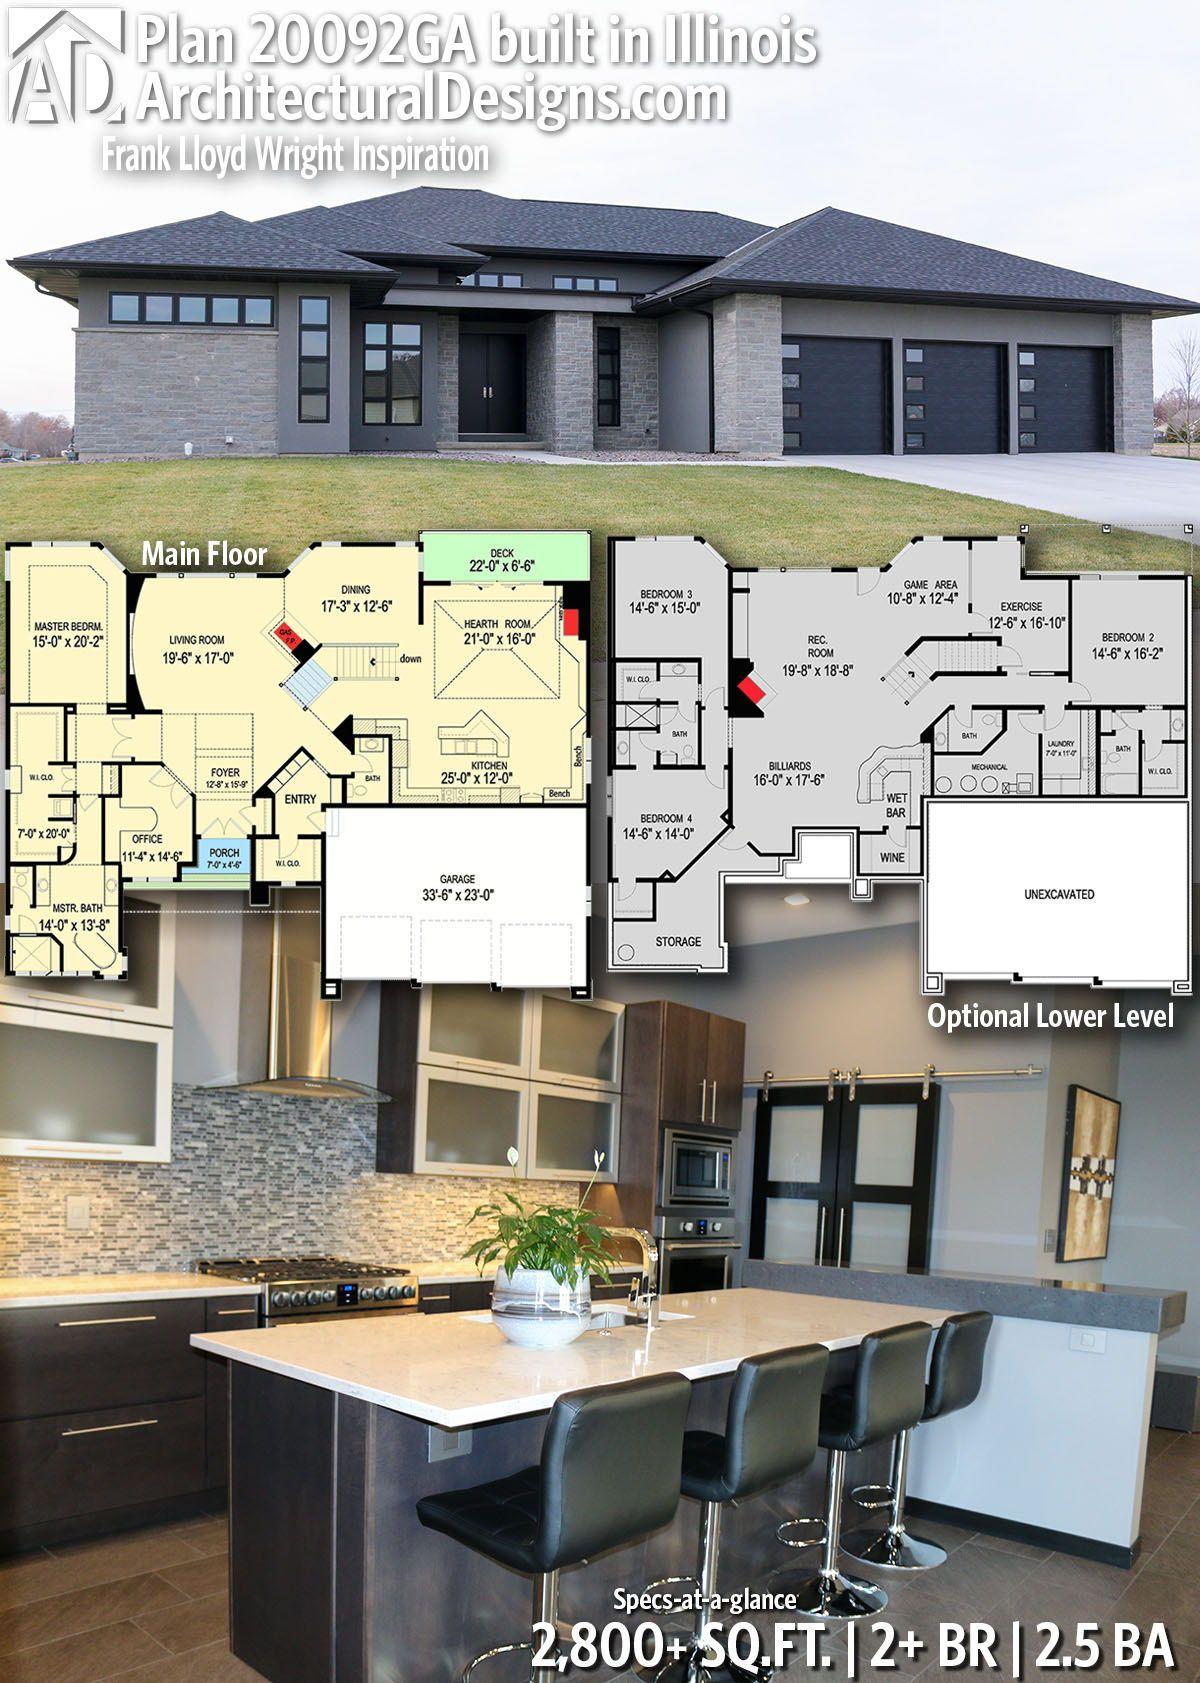 Plan 20092ga Frank Lloyd Wright Inspiration Building Plans House House Plans Building A House